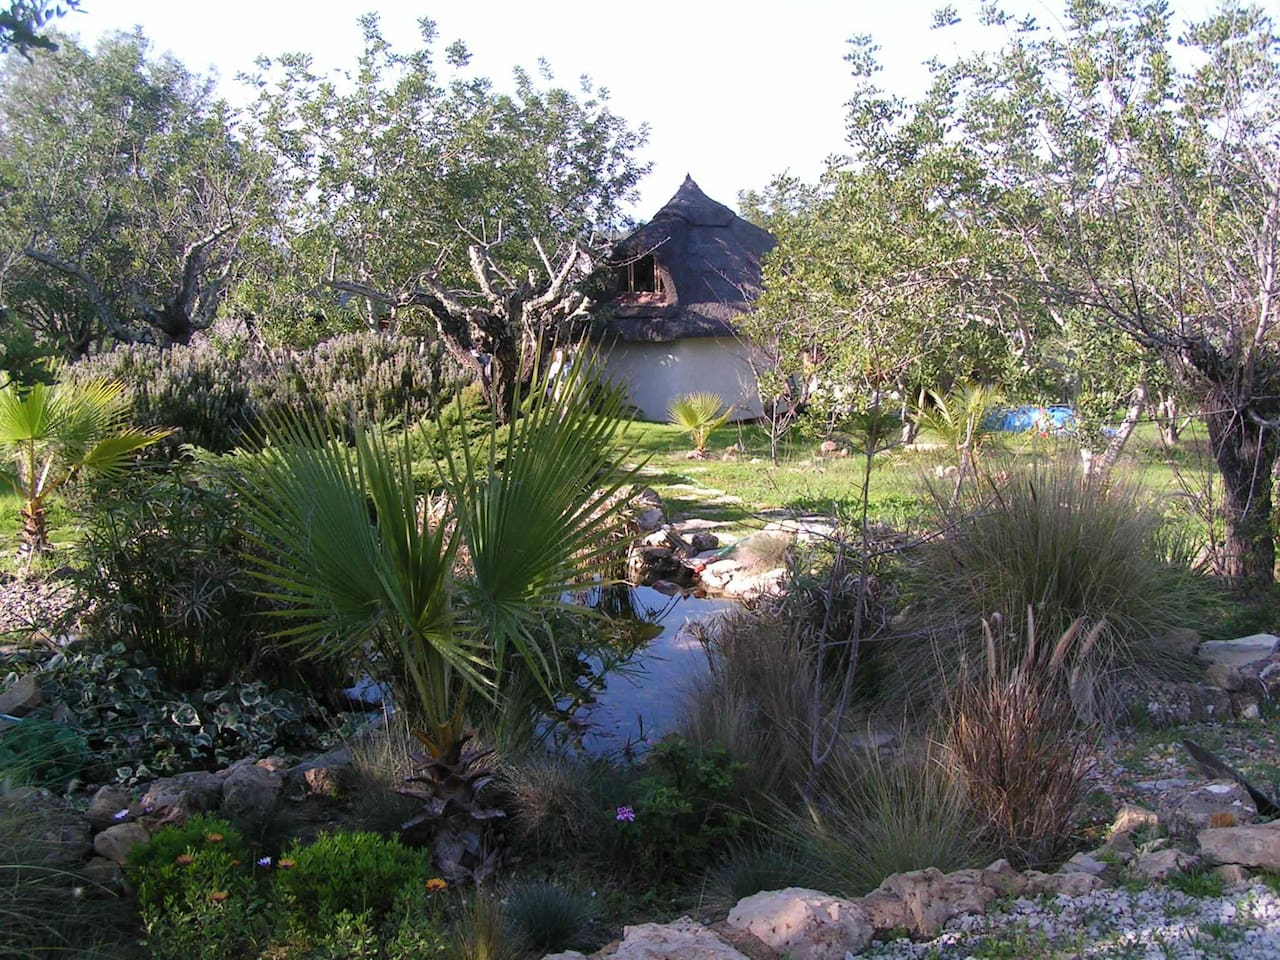 Peaceful Pixie Hut, Algarve.